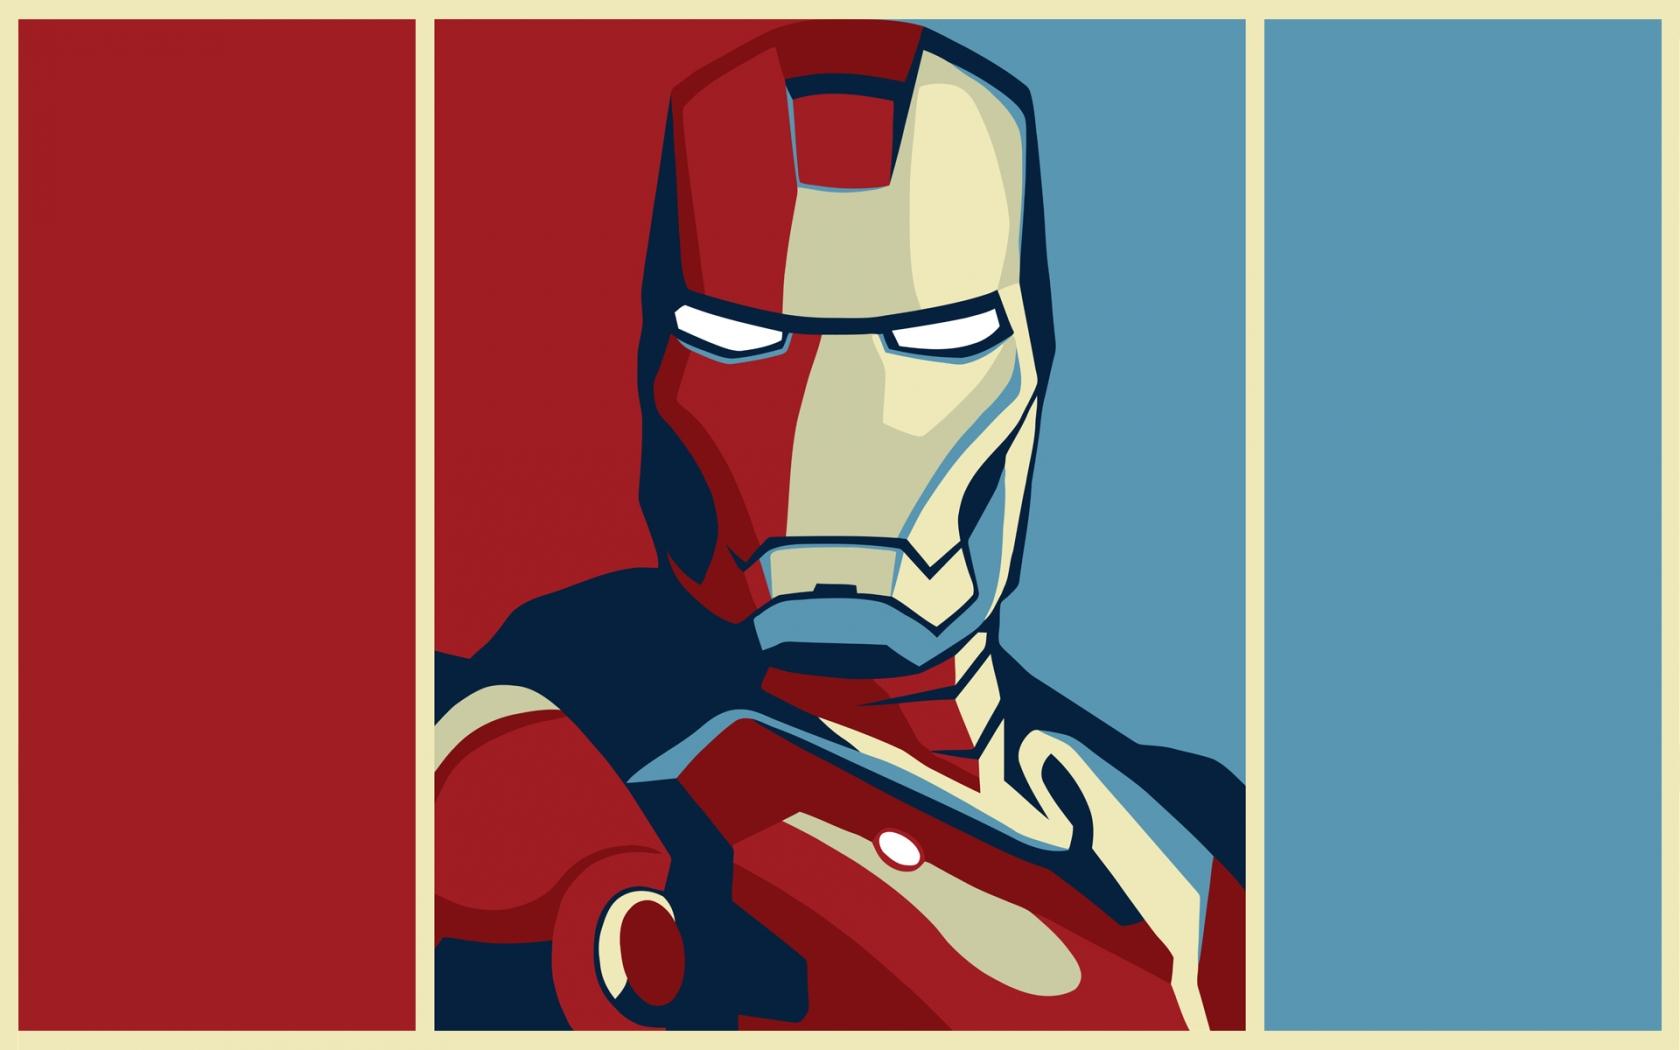 Dibujo de Iron Man - 1680x1050